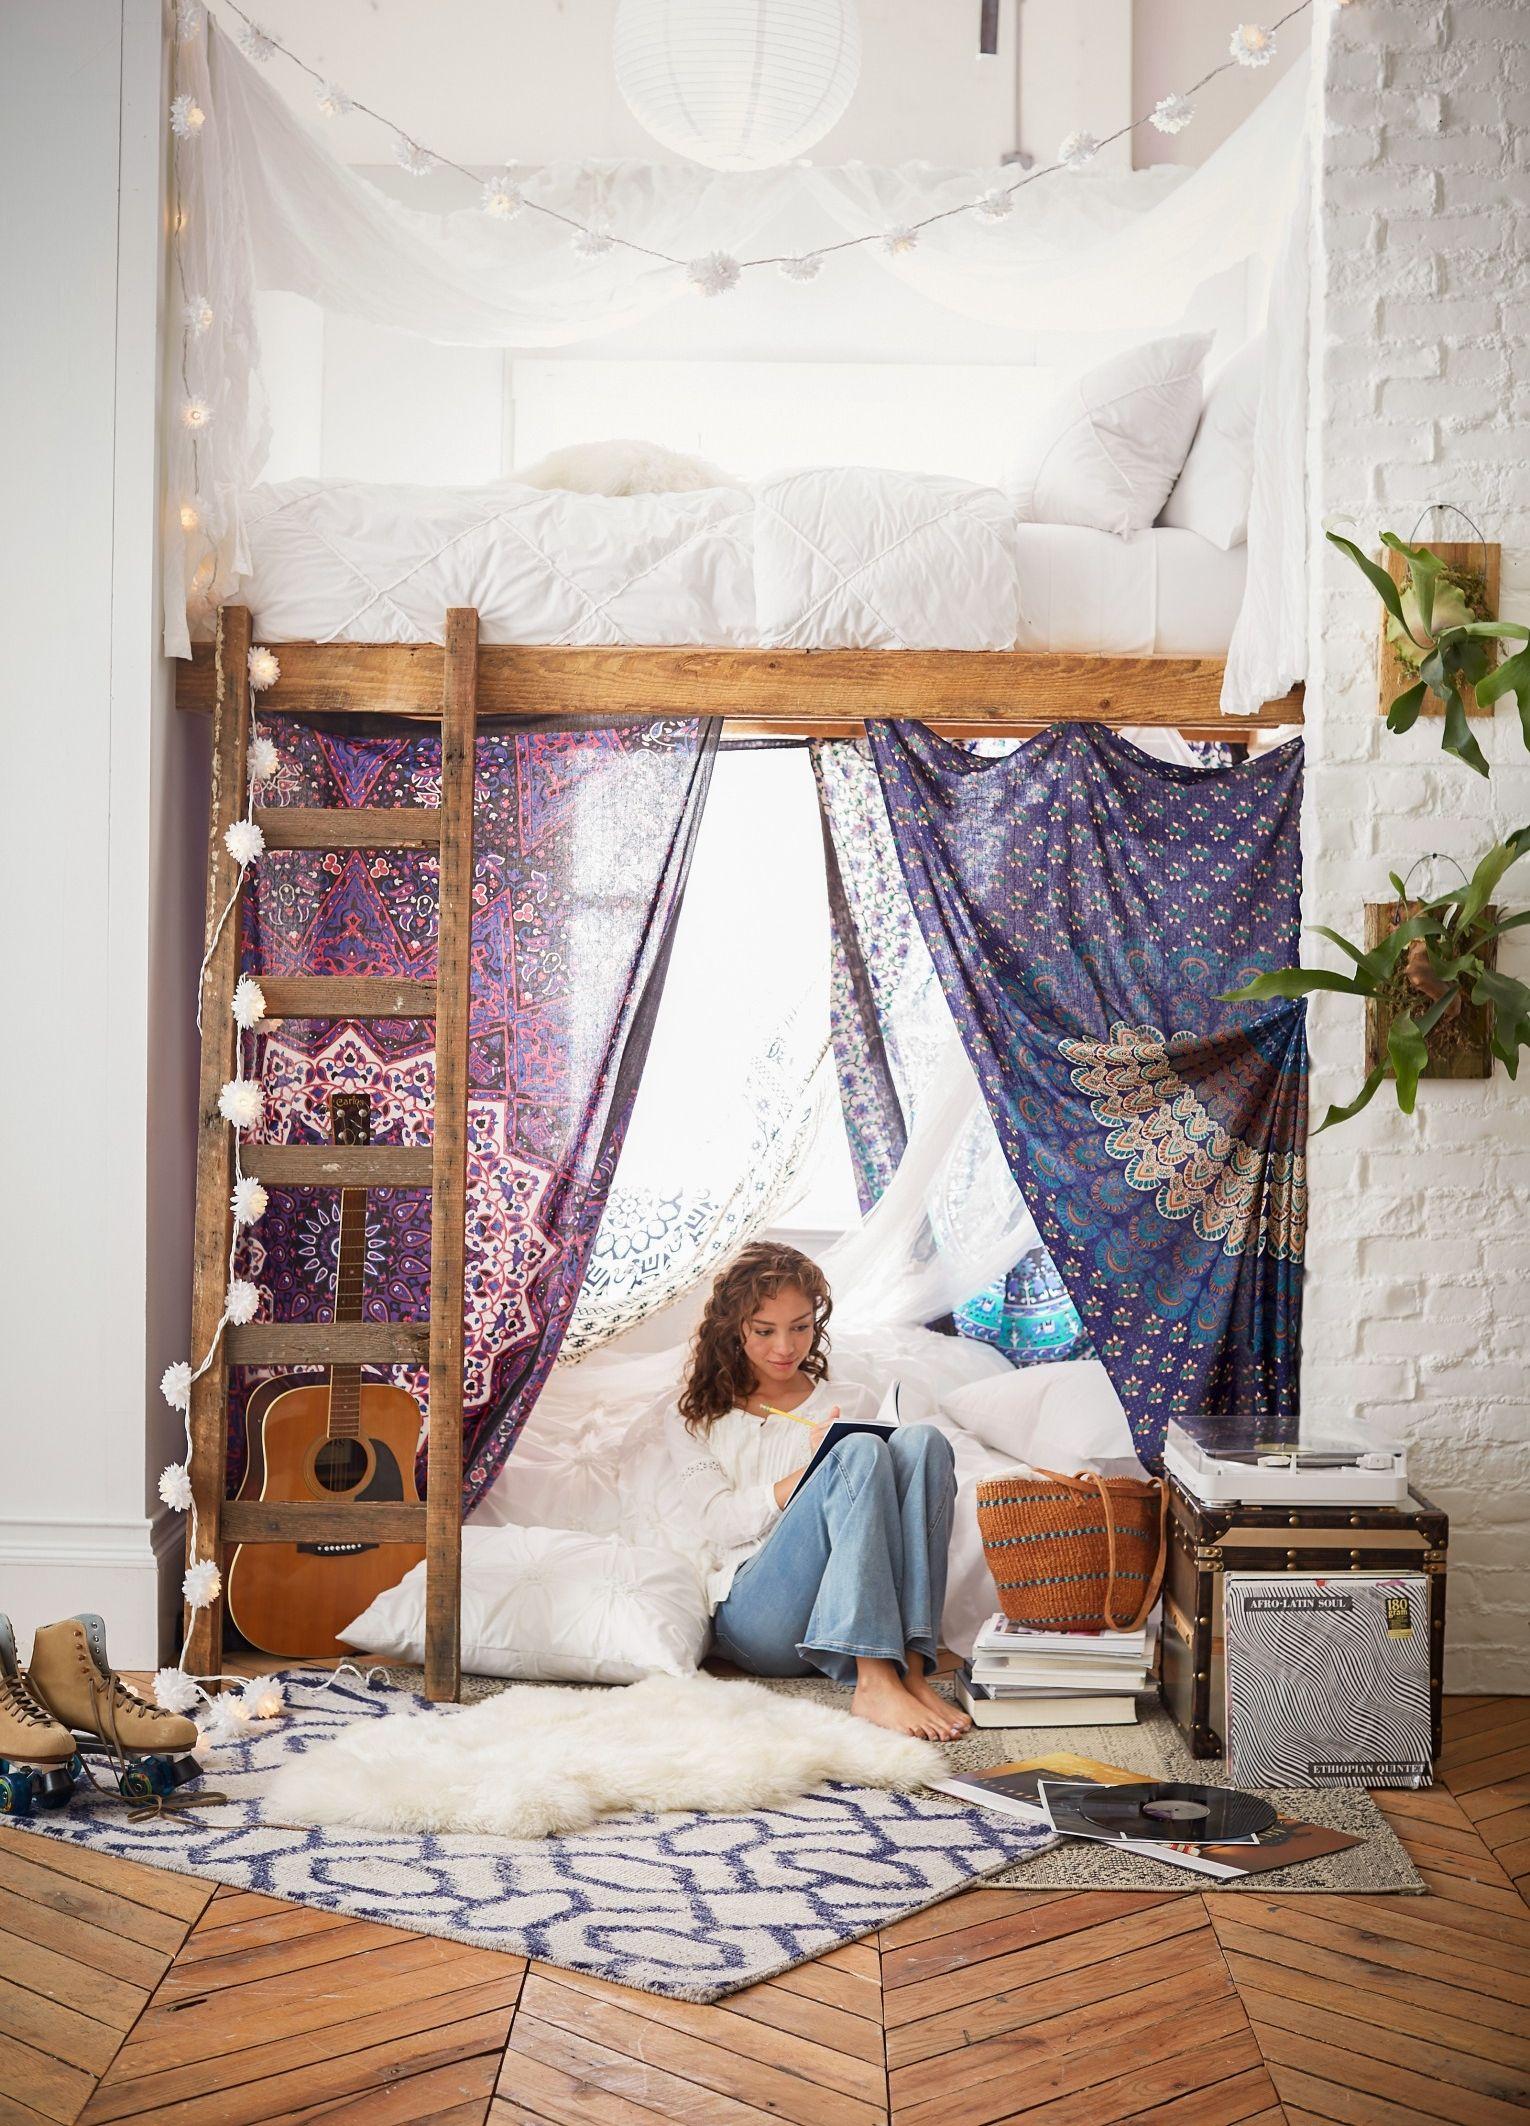 inspirerende teenageværelser   Imagenes  Pinterest  Bedroom